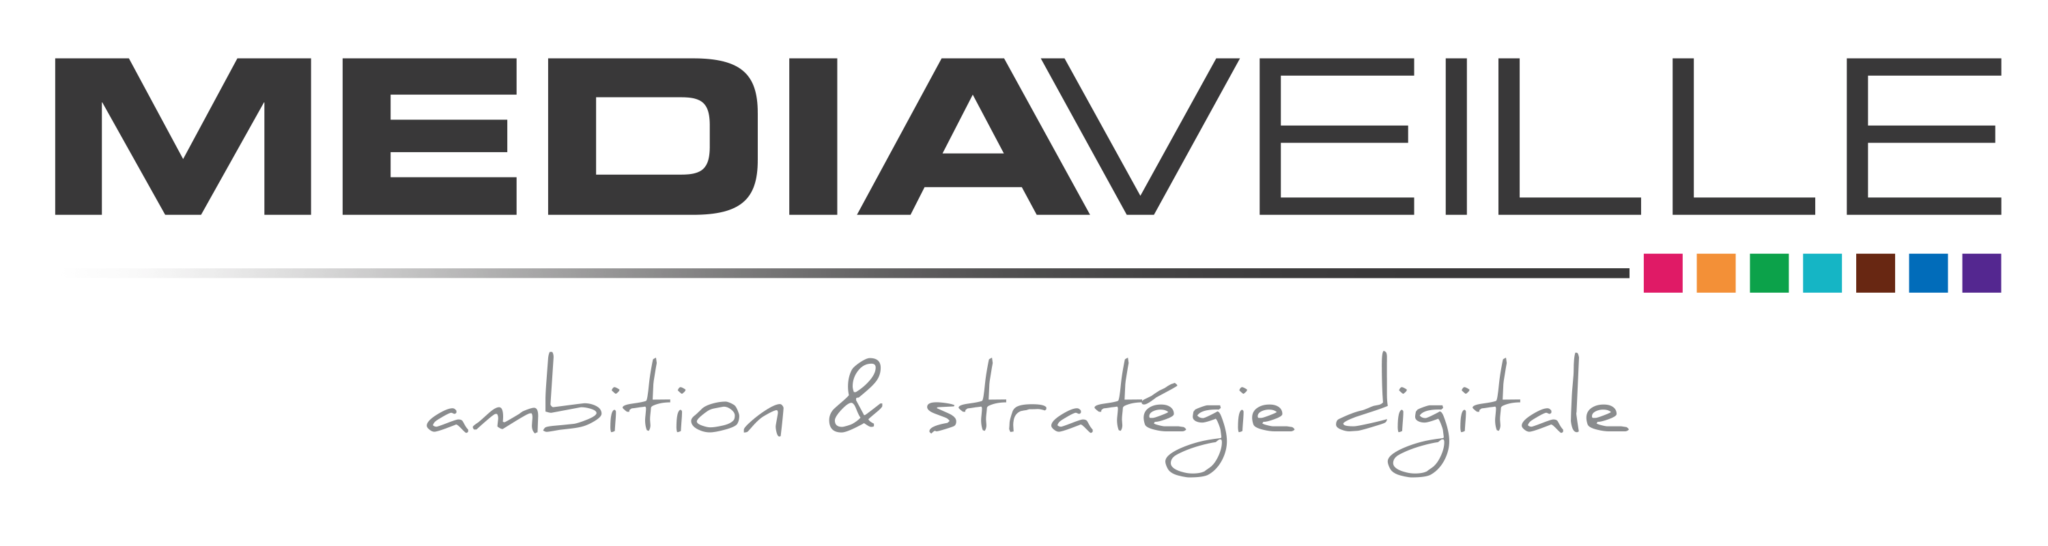 Mediaveille logo